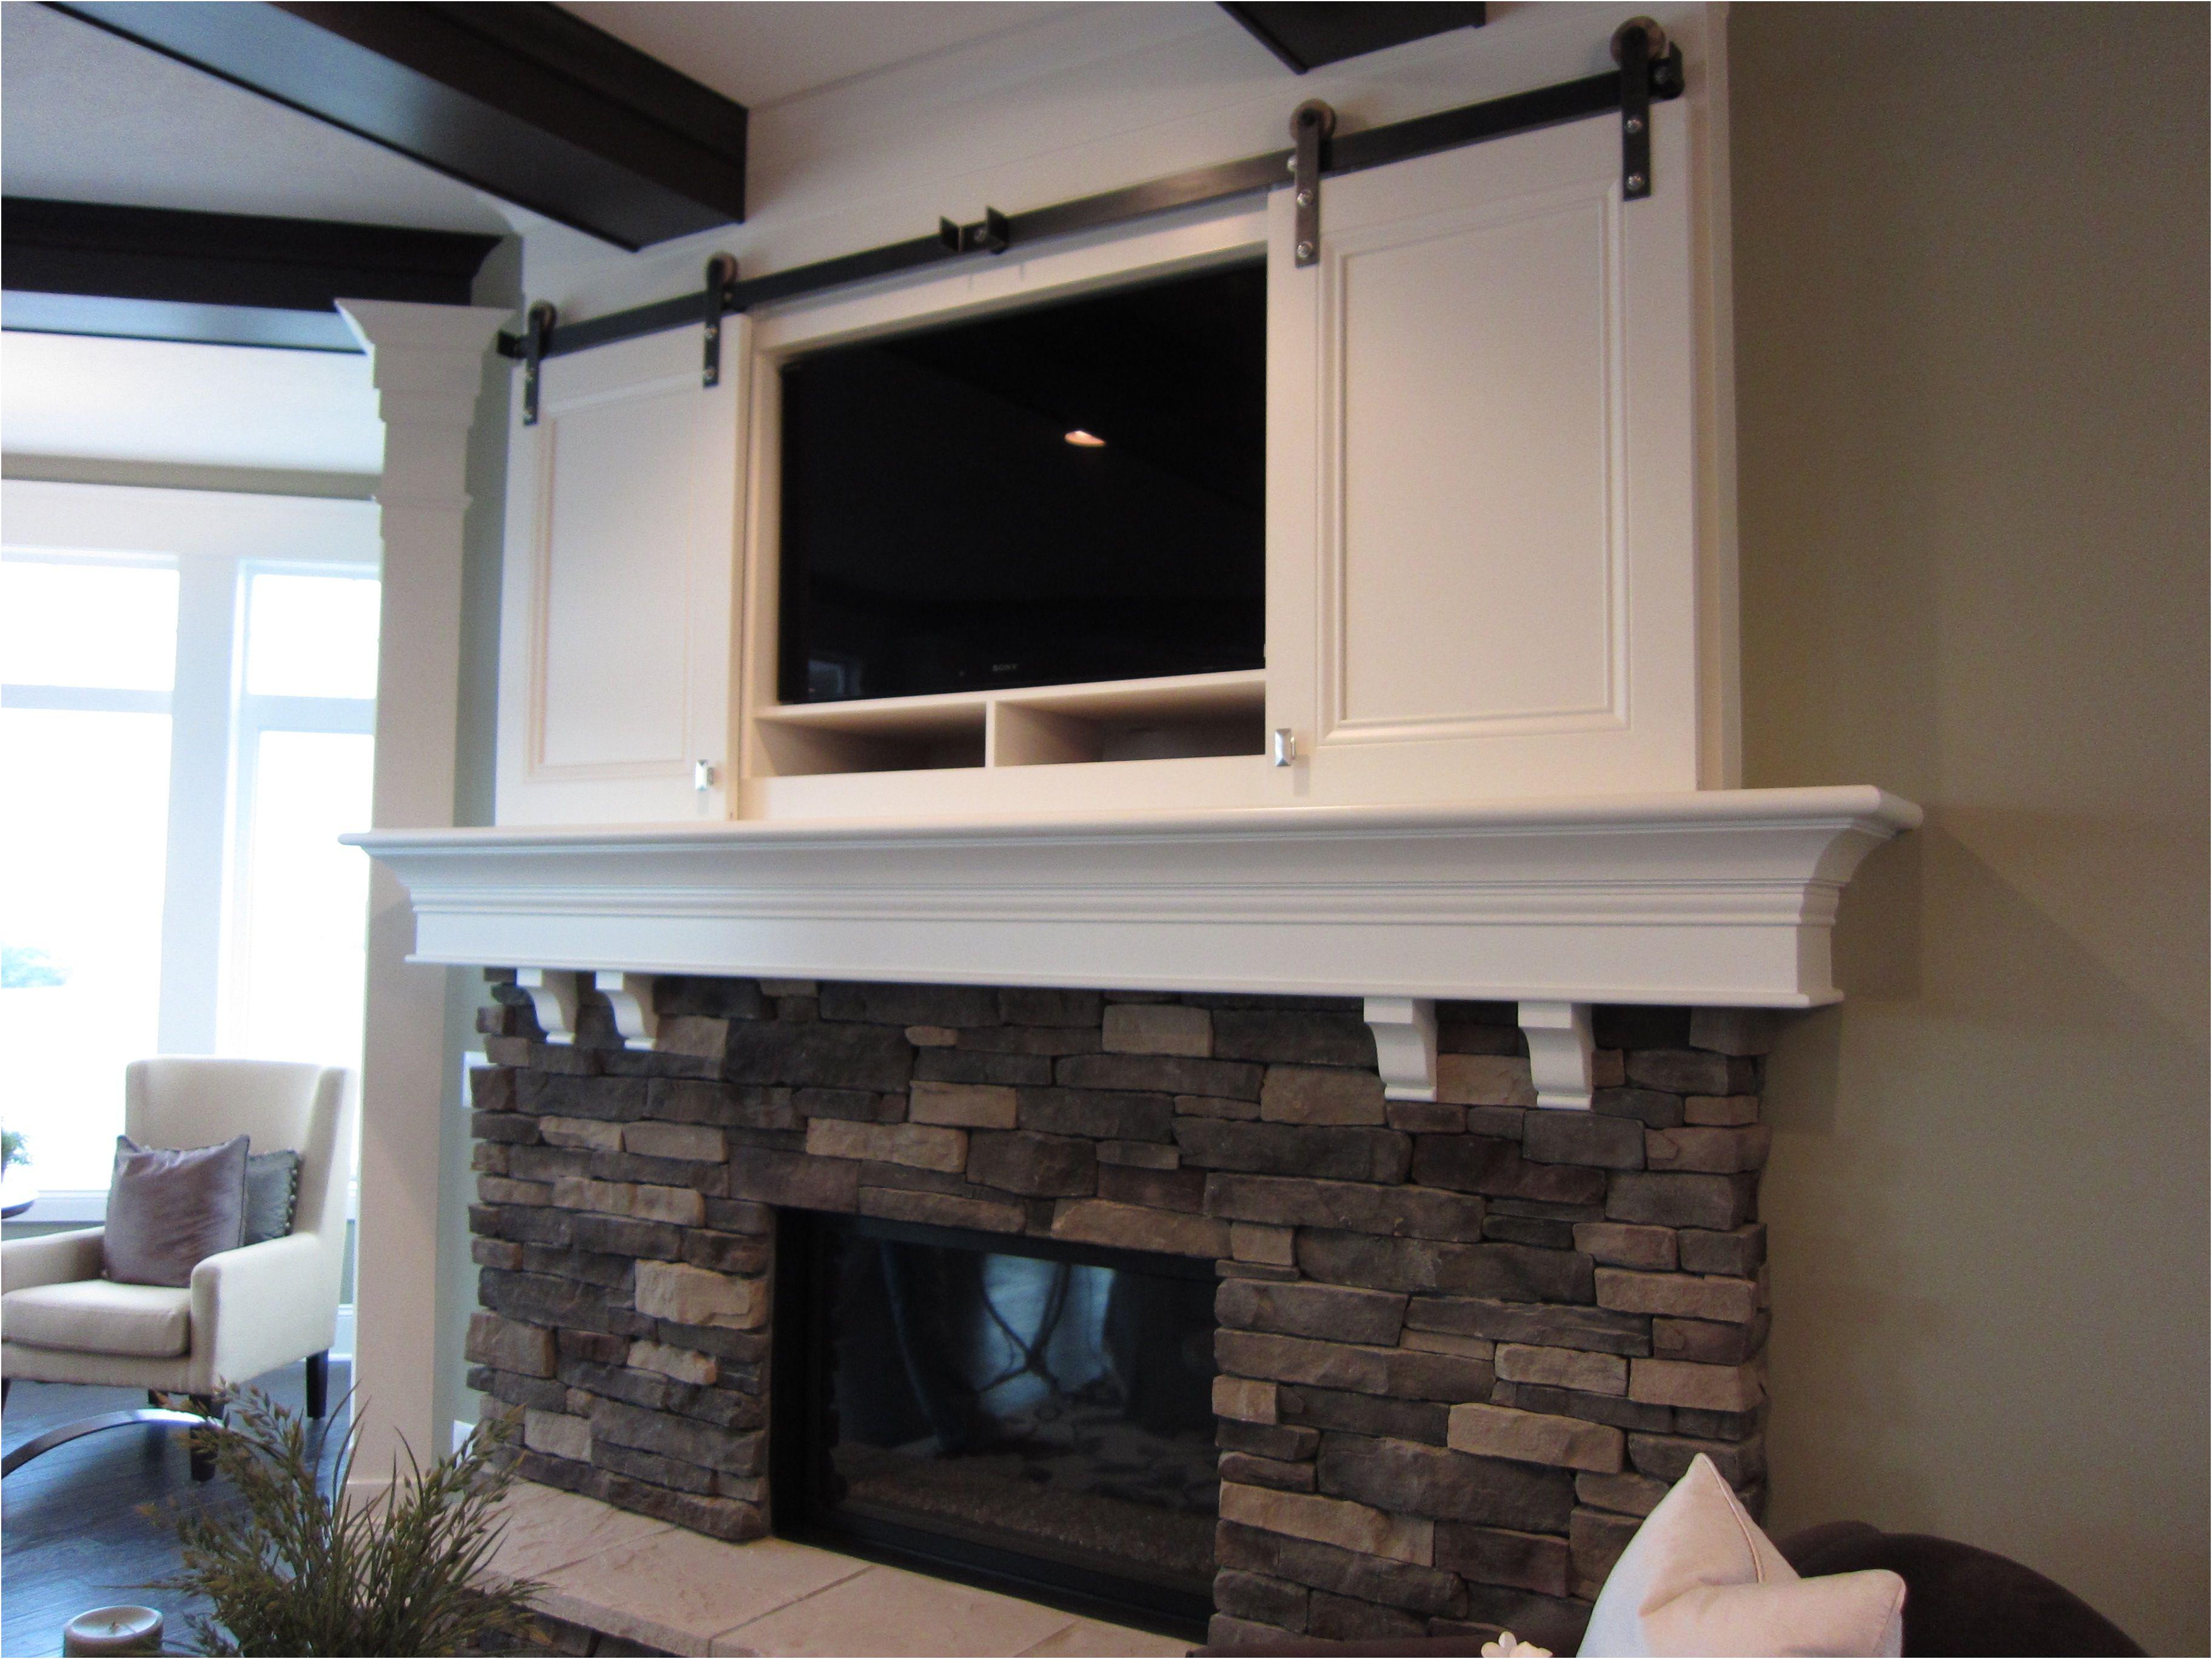 Fresh Refacing Fireplace Ideas